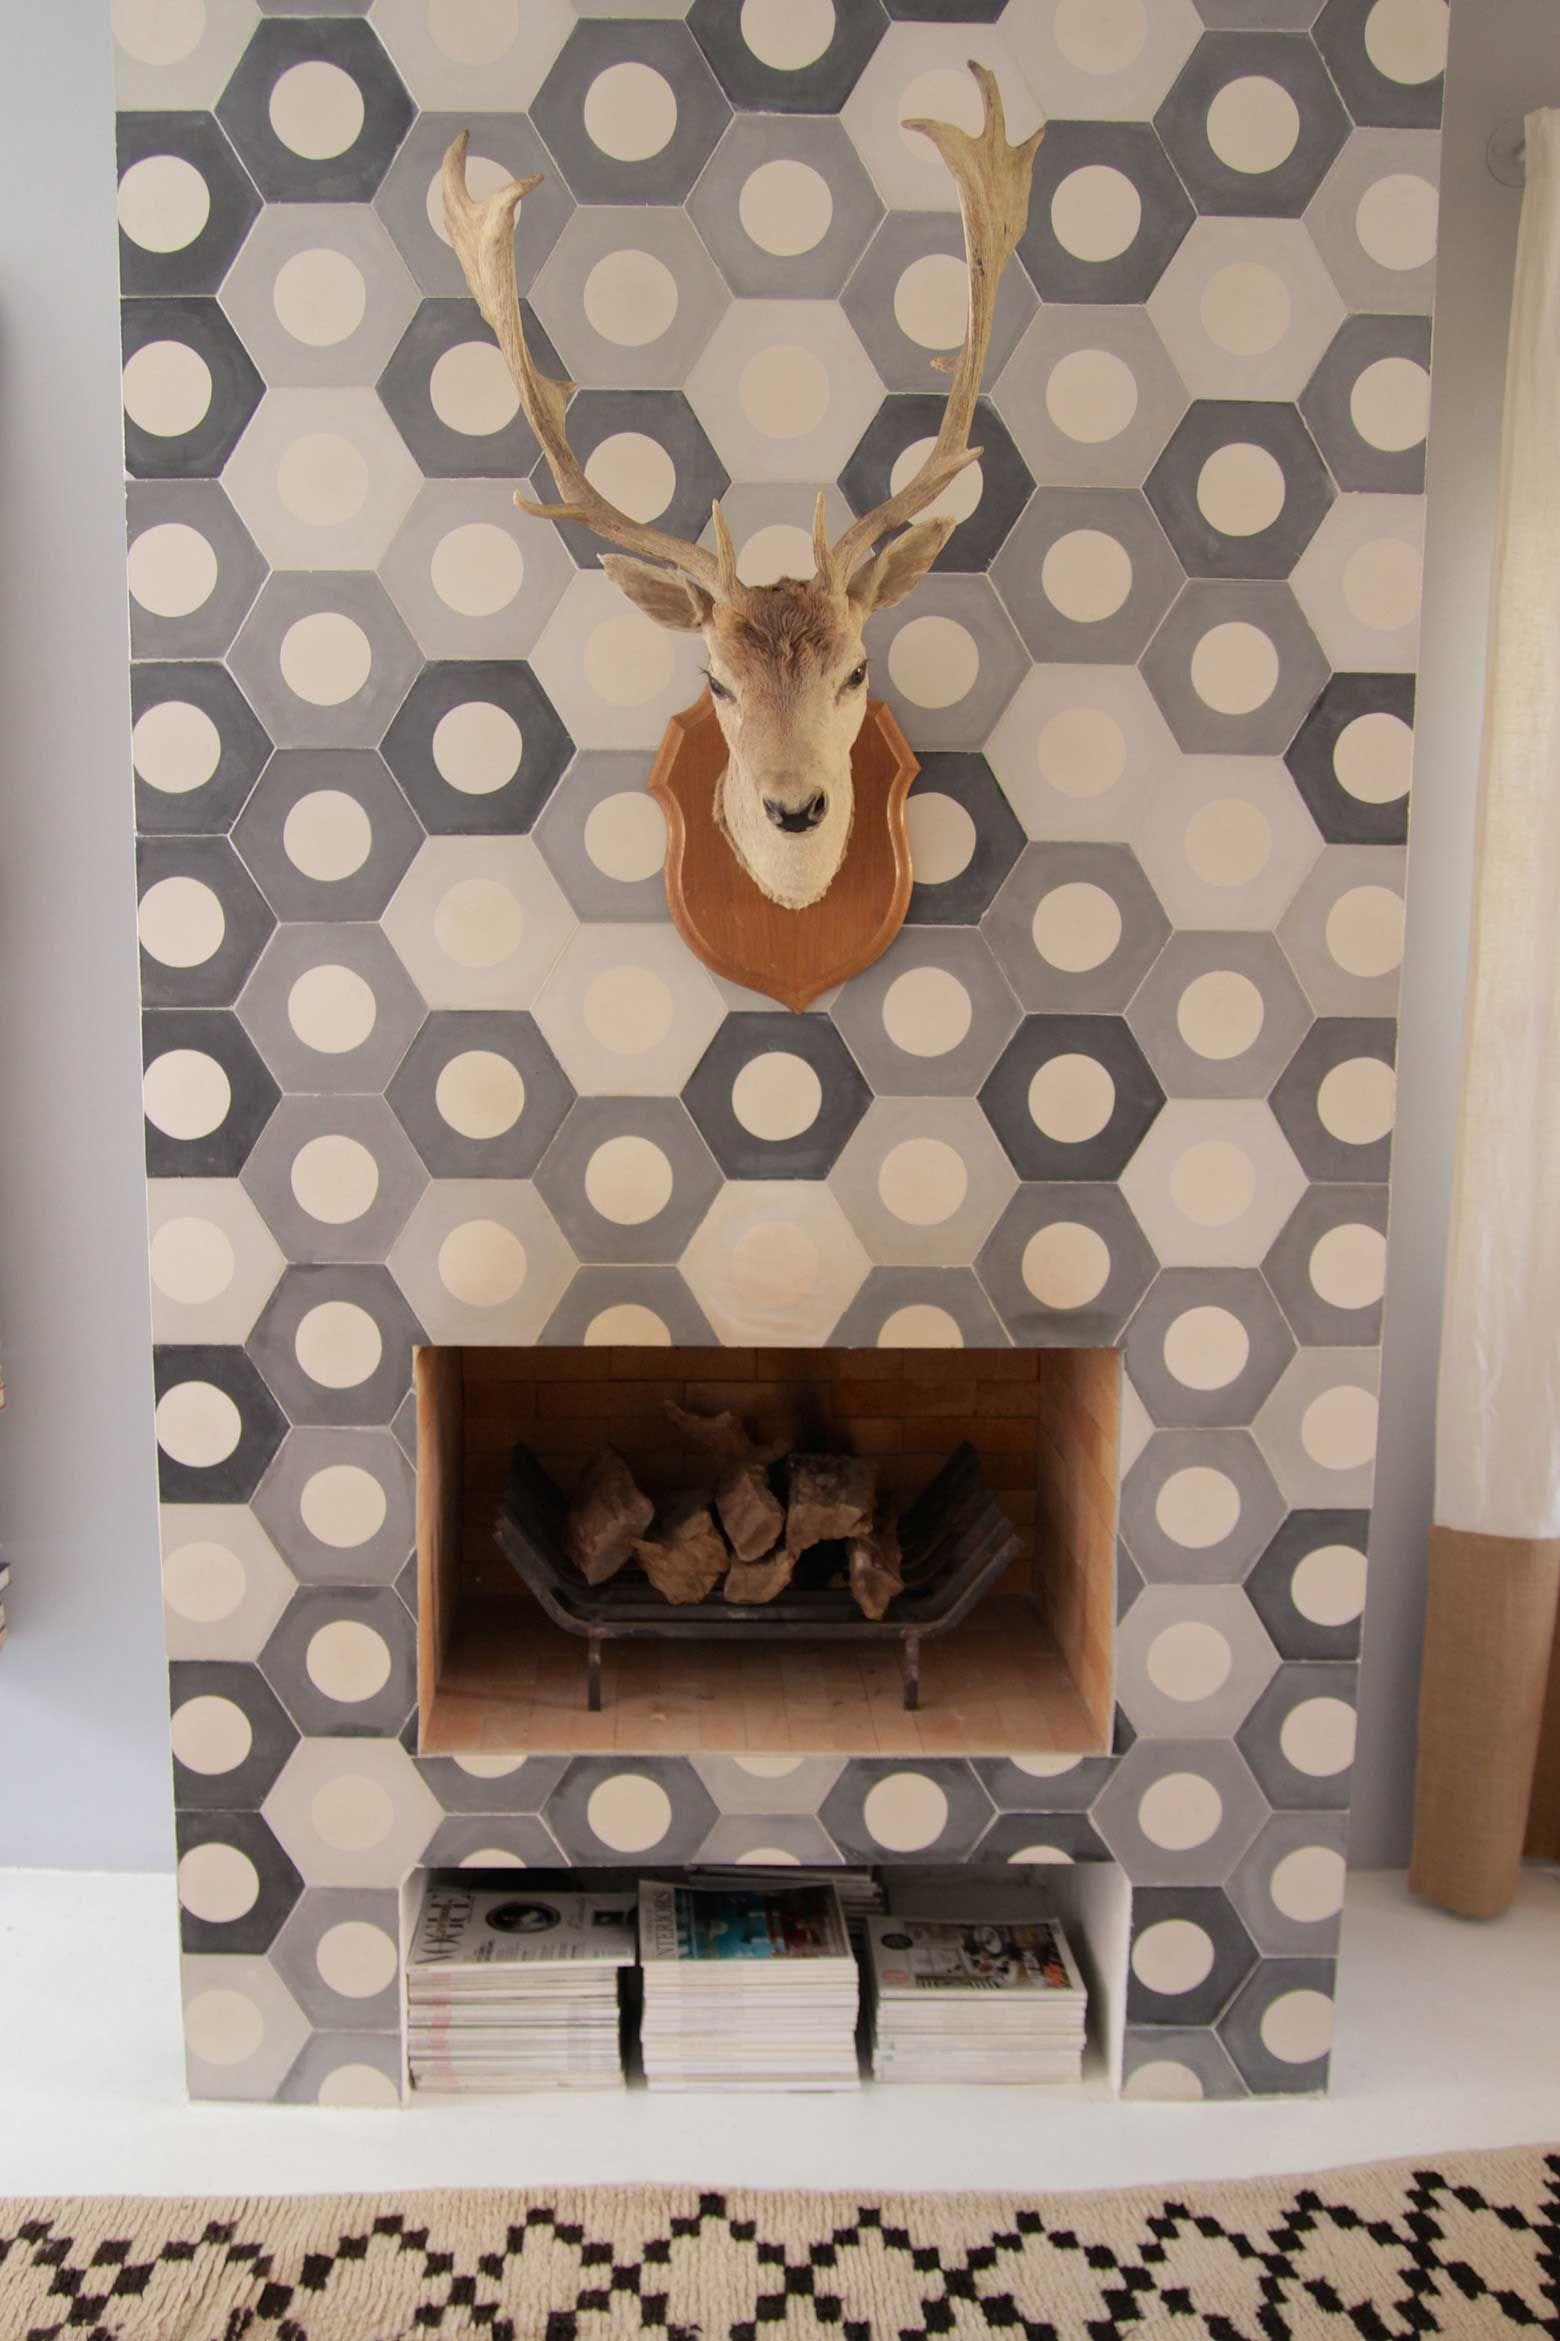 popham design cement tiles handmade in morocco mood boards